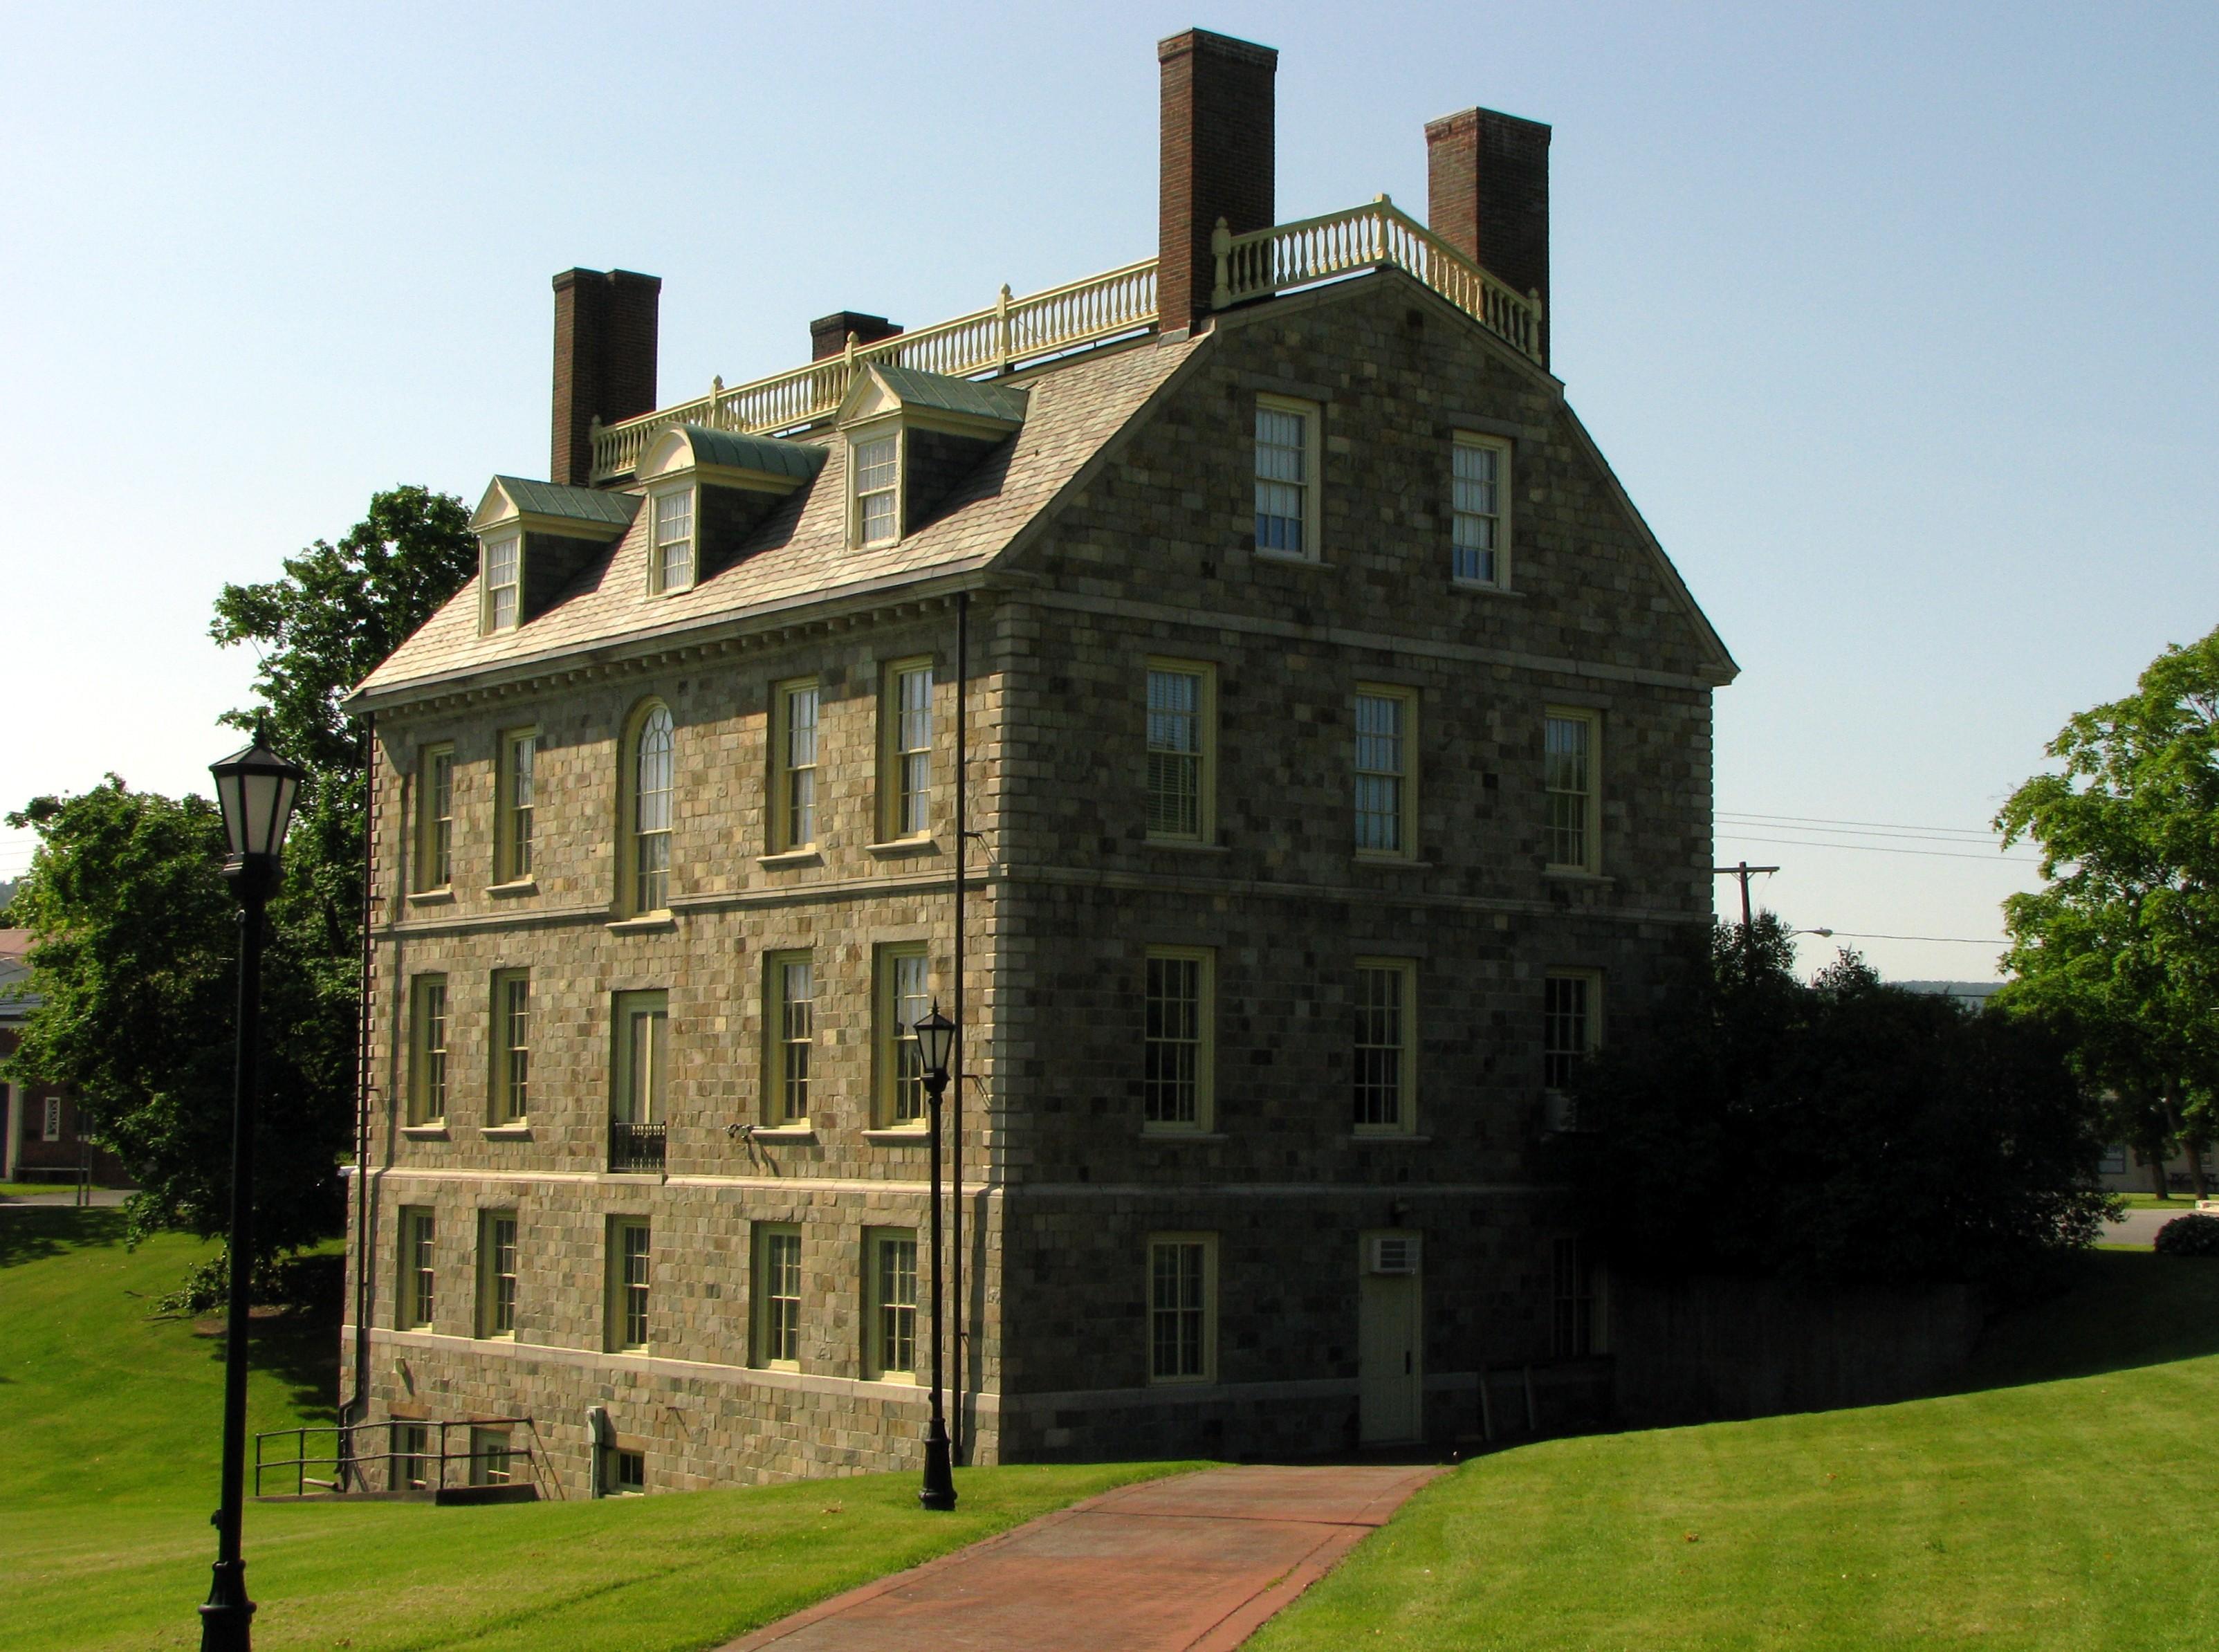 Early American Furniture Reproductions File:Hancock House, Ticonderoga, NY.jpg - Wikipedia